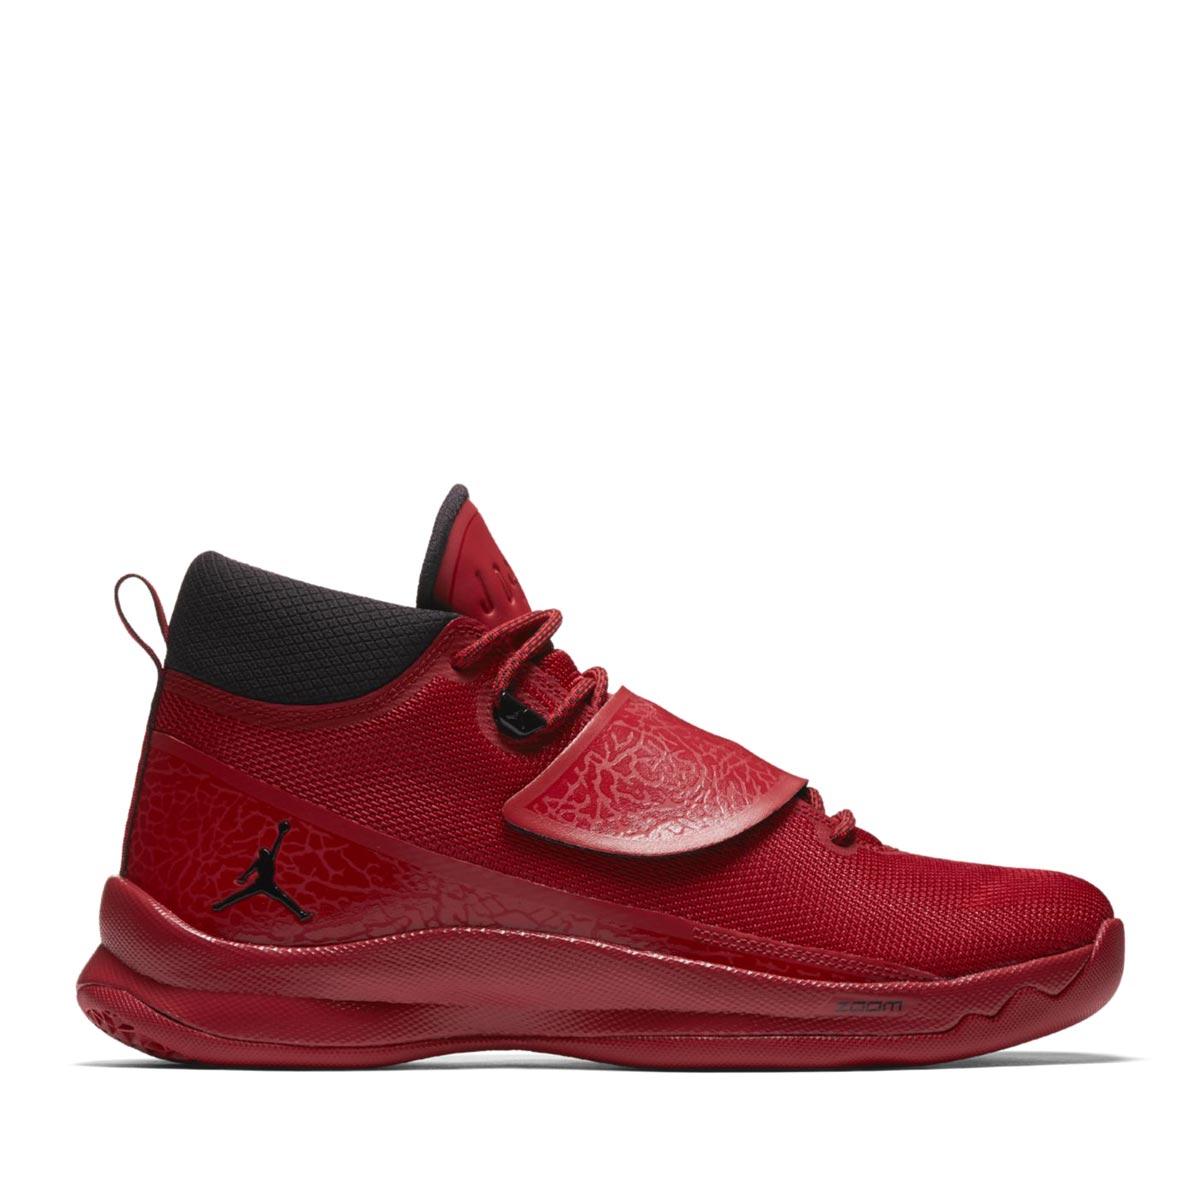 d39e757e02f1 NIKE JORDAN SUPER.FLY 5 PO (Nike Jordan super fly 5 PO) GYM RED BLACK-GYM  RED 17SP-I